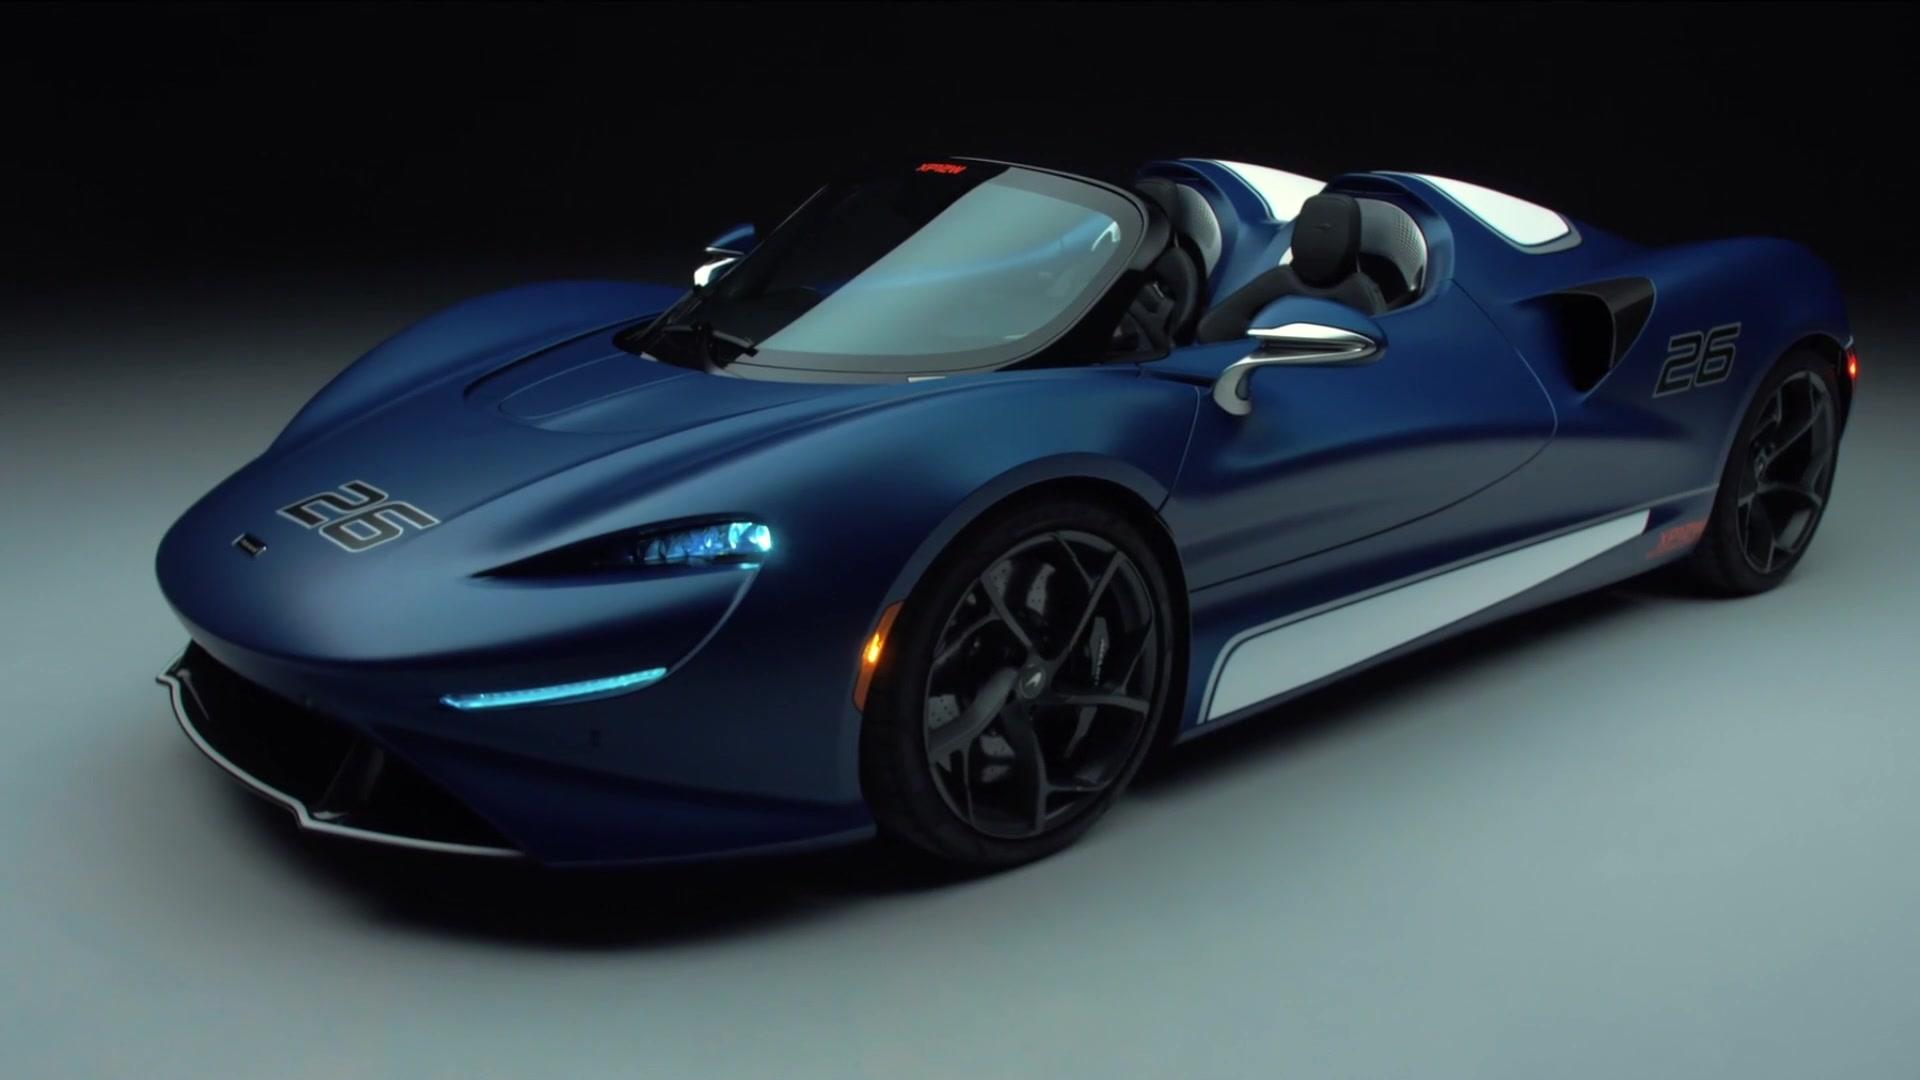 The Ultimate open-top roadster experience - windscreen version of ultra-exclusive McLaren Elva enters production